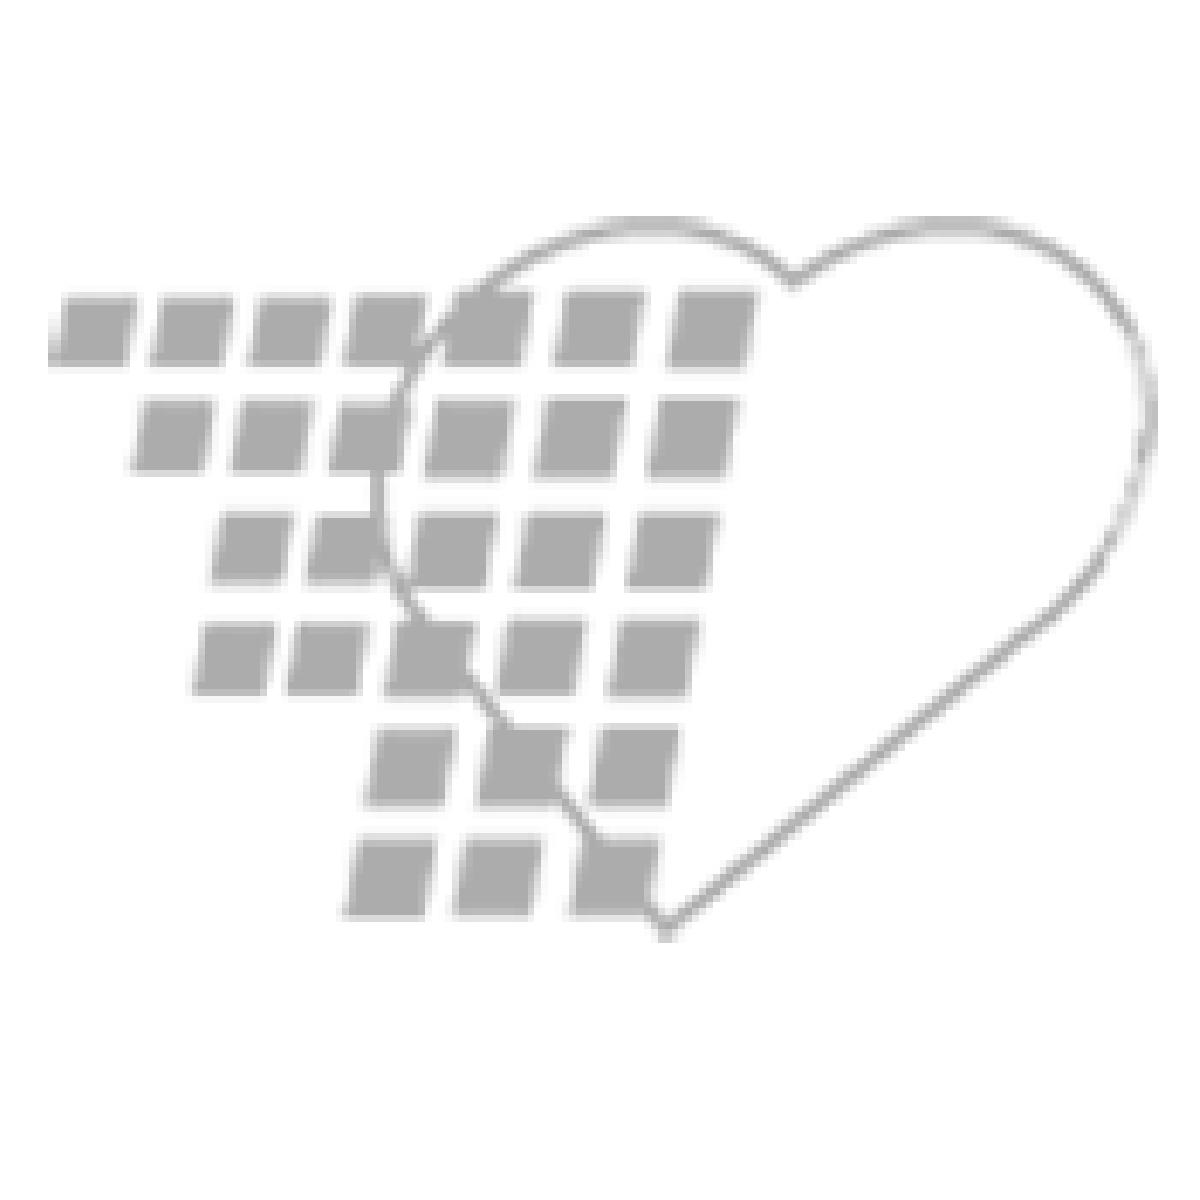 05-02-0750 - PDI® Prevantics   ® Swabstick - ORMD